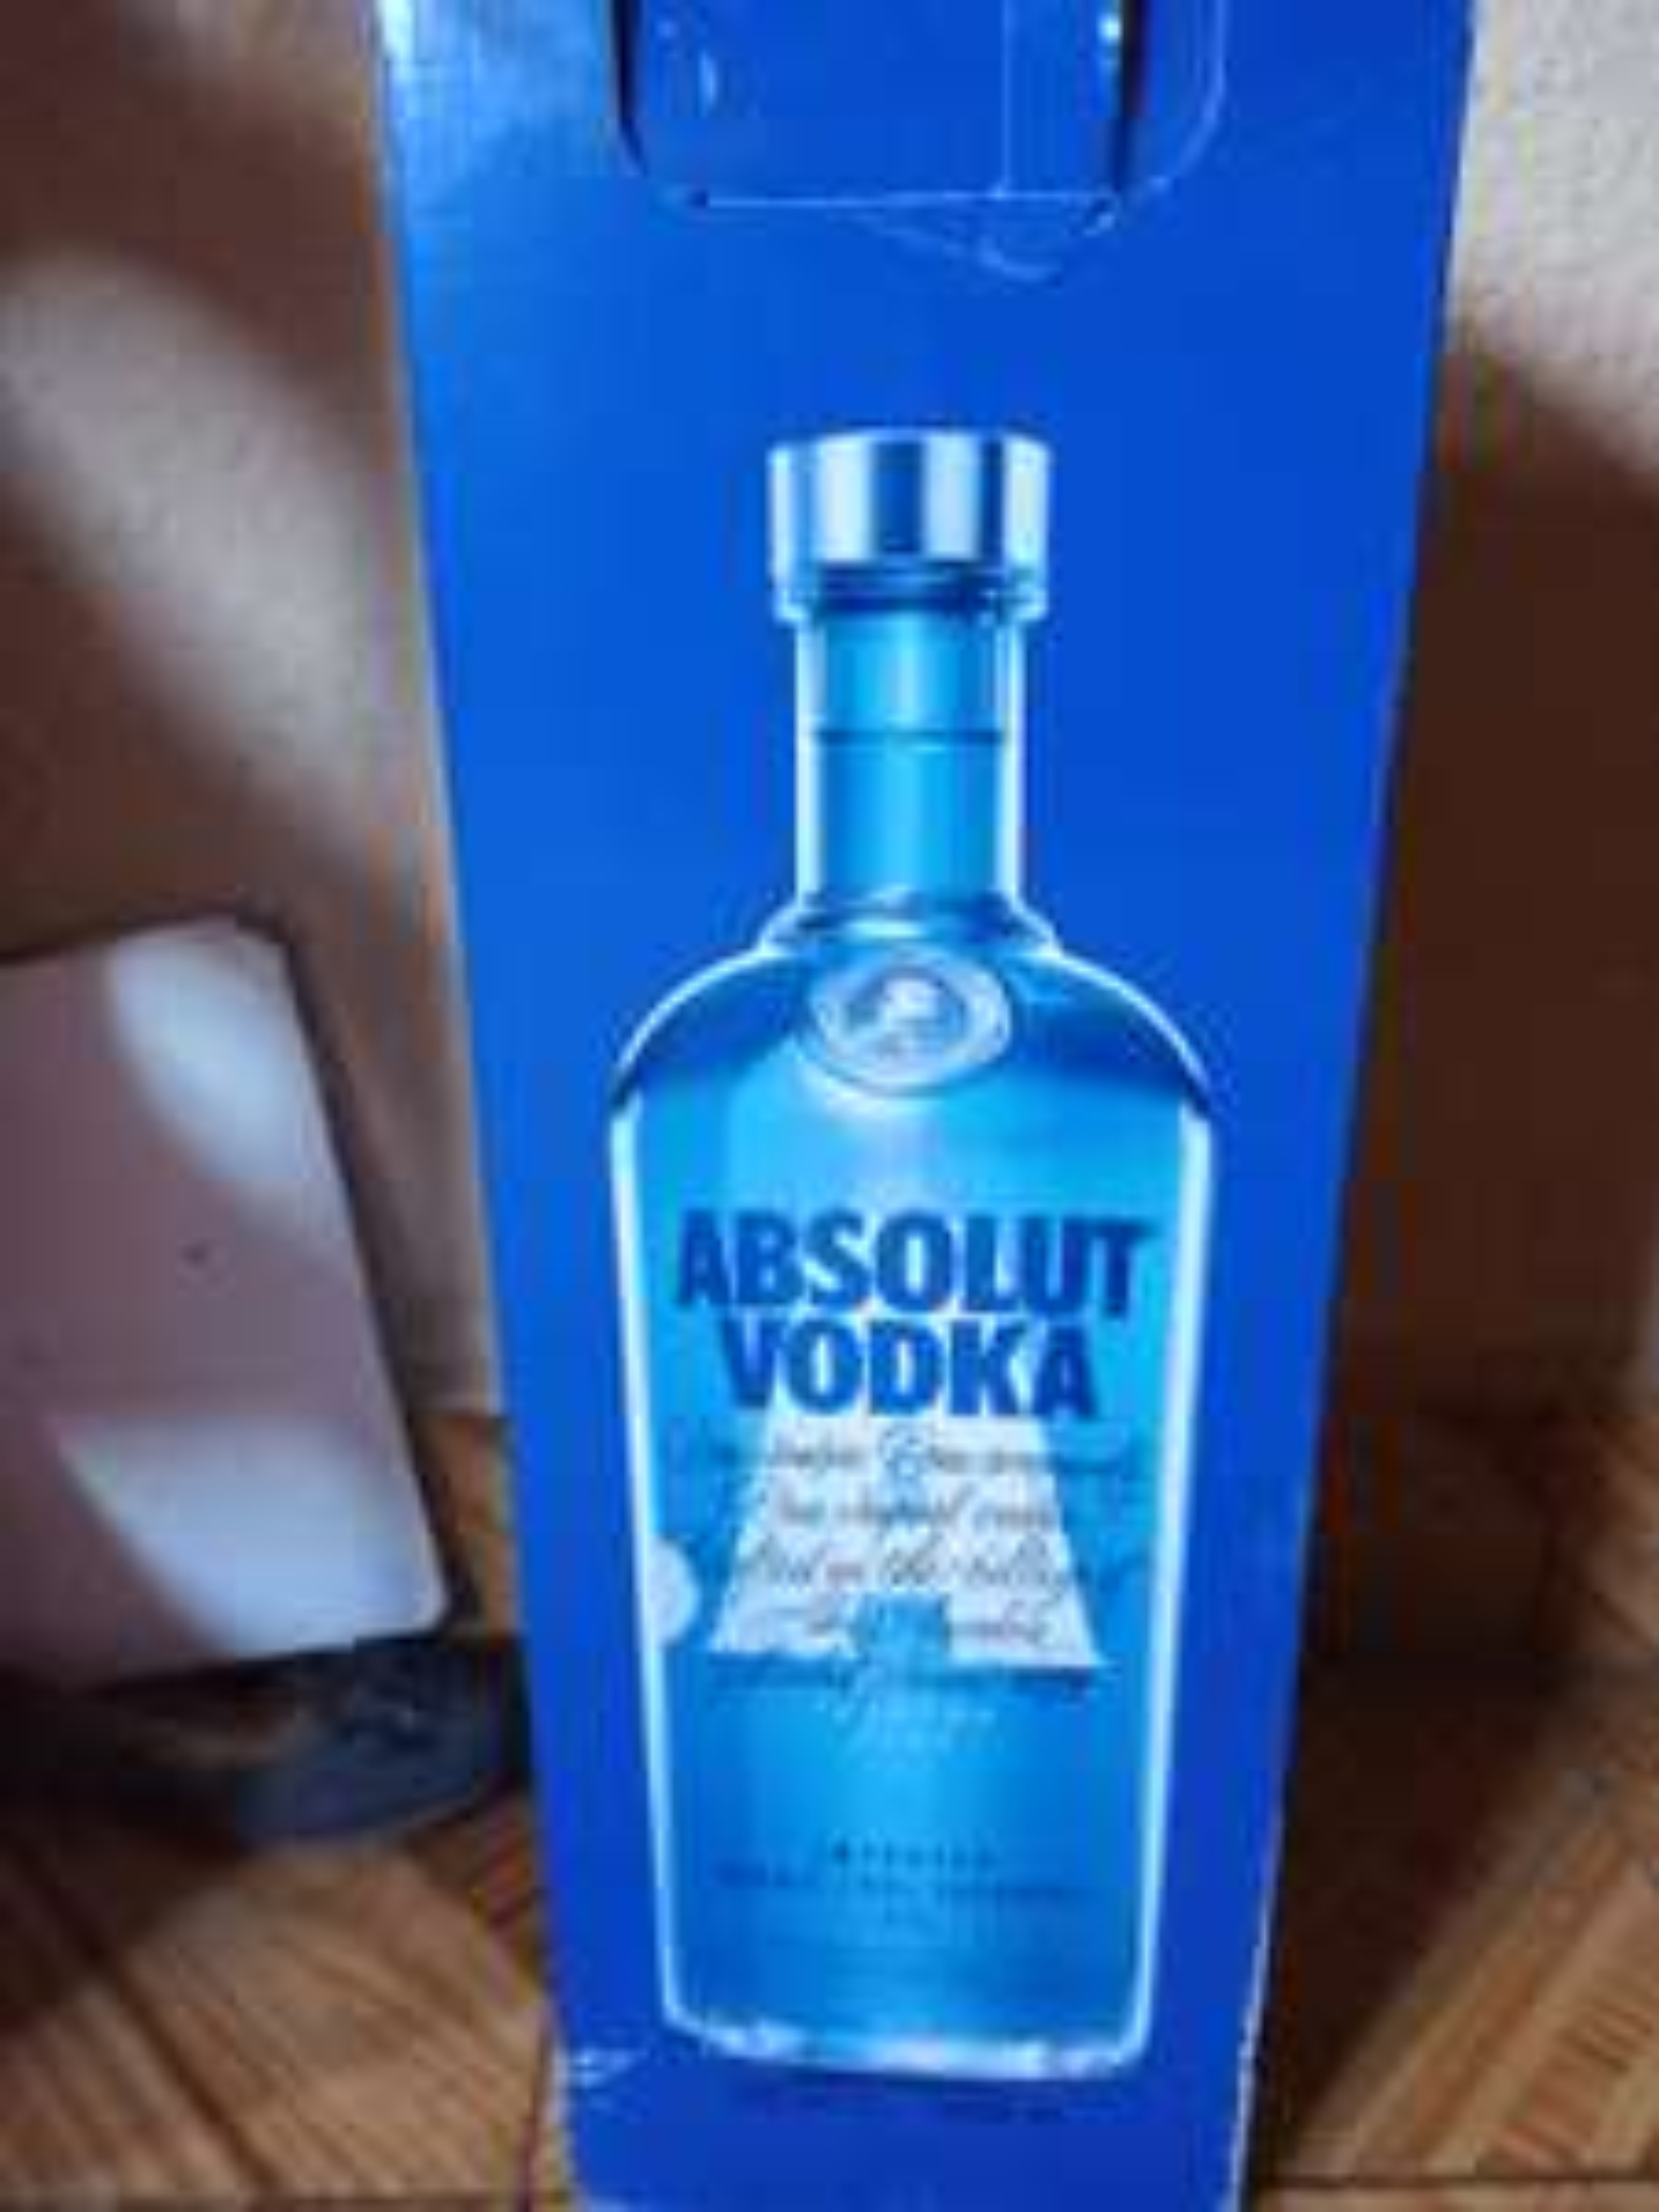 Sam's Club: Vodka absolut azul 4.5 a $299 también encontré chivas 18 de 3L a 760 y Martell de 3 L a $460